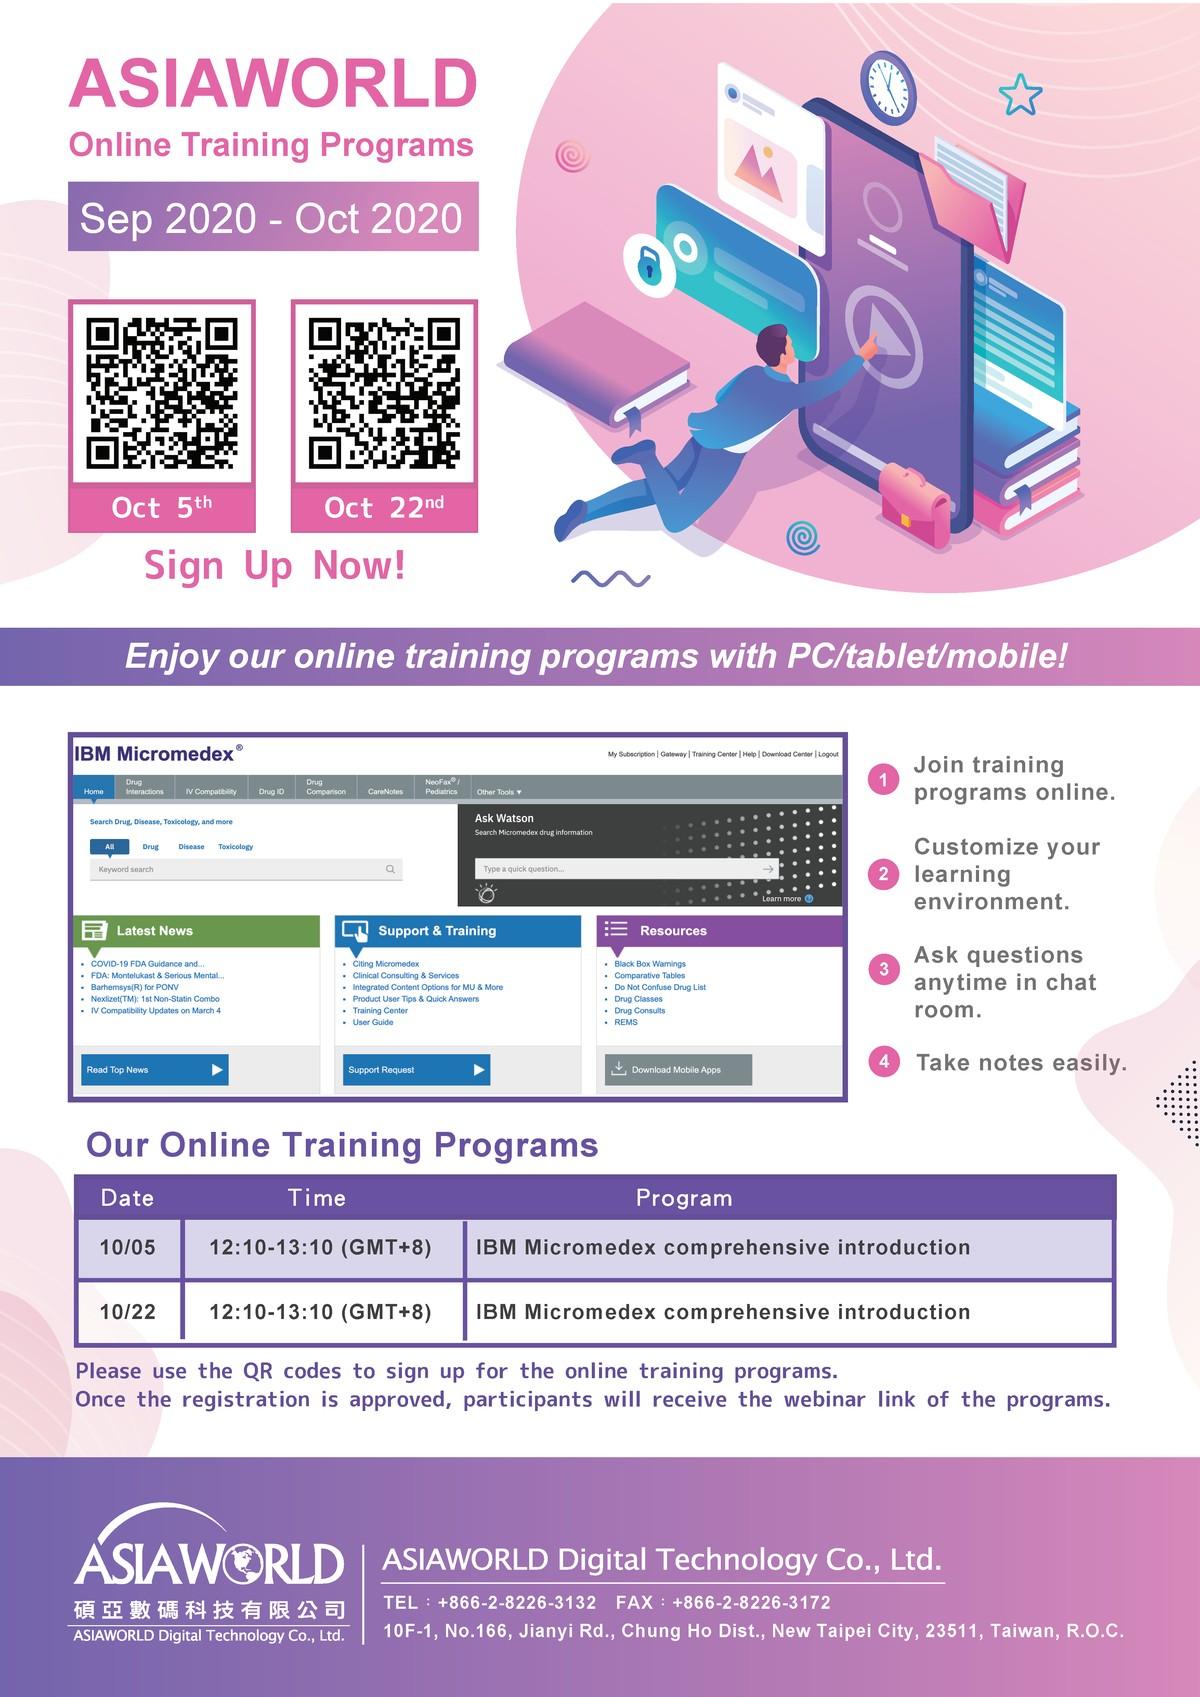 IBM Micromedex Comprehensive Introduction Online Training